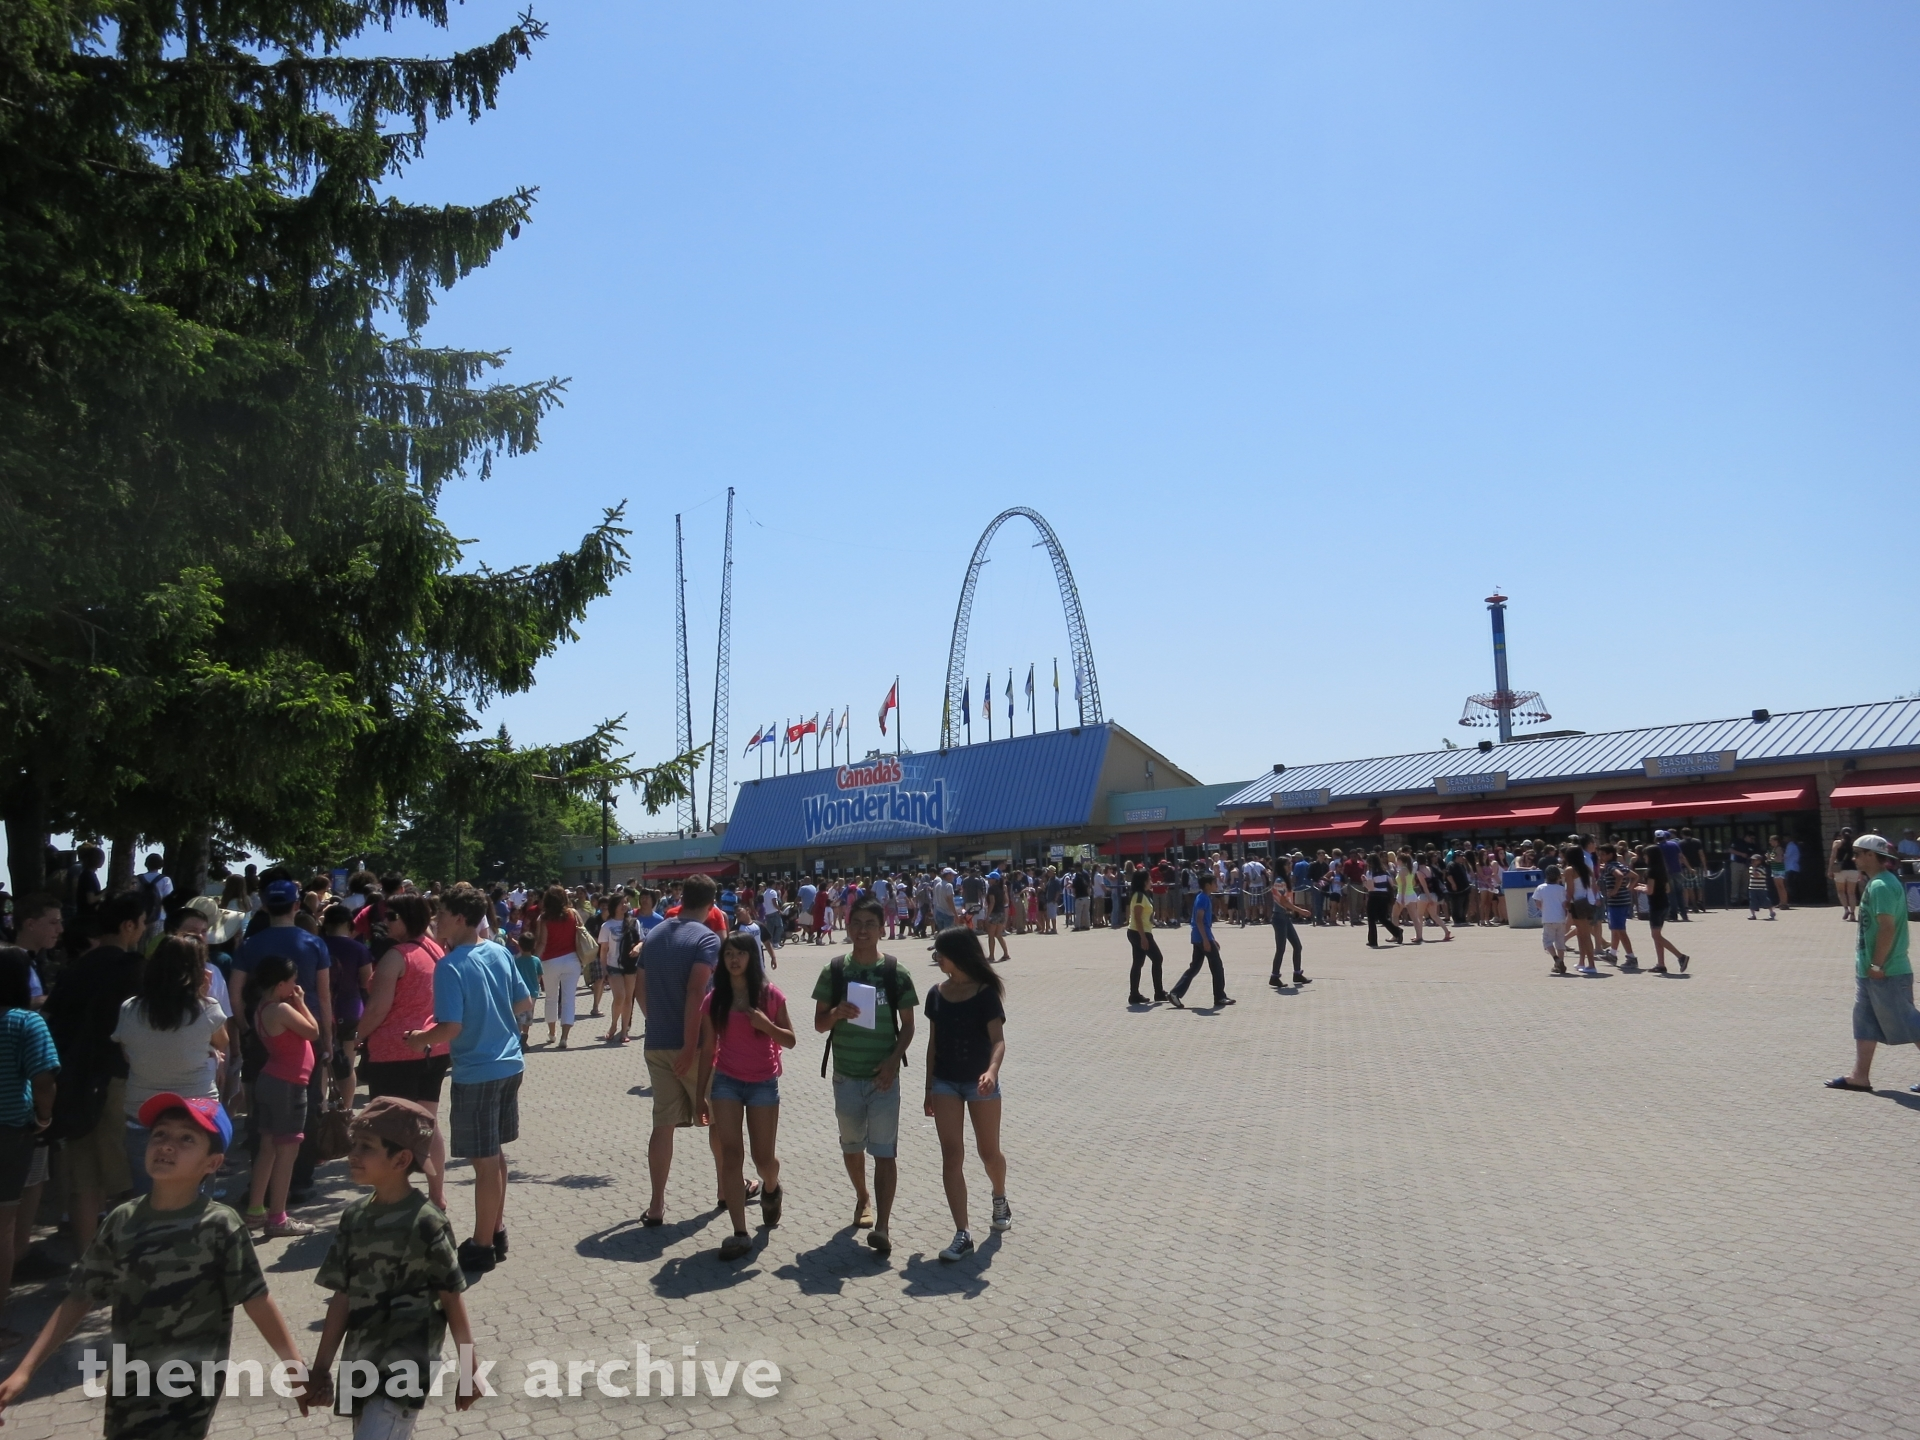 Main Entrance and Exit at Canada's Wonderland